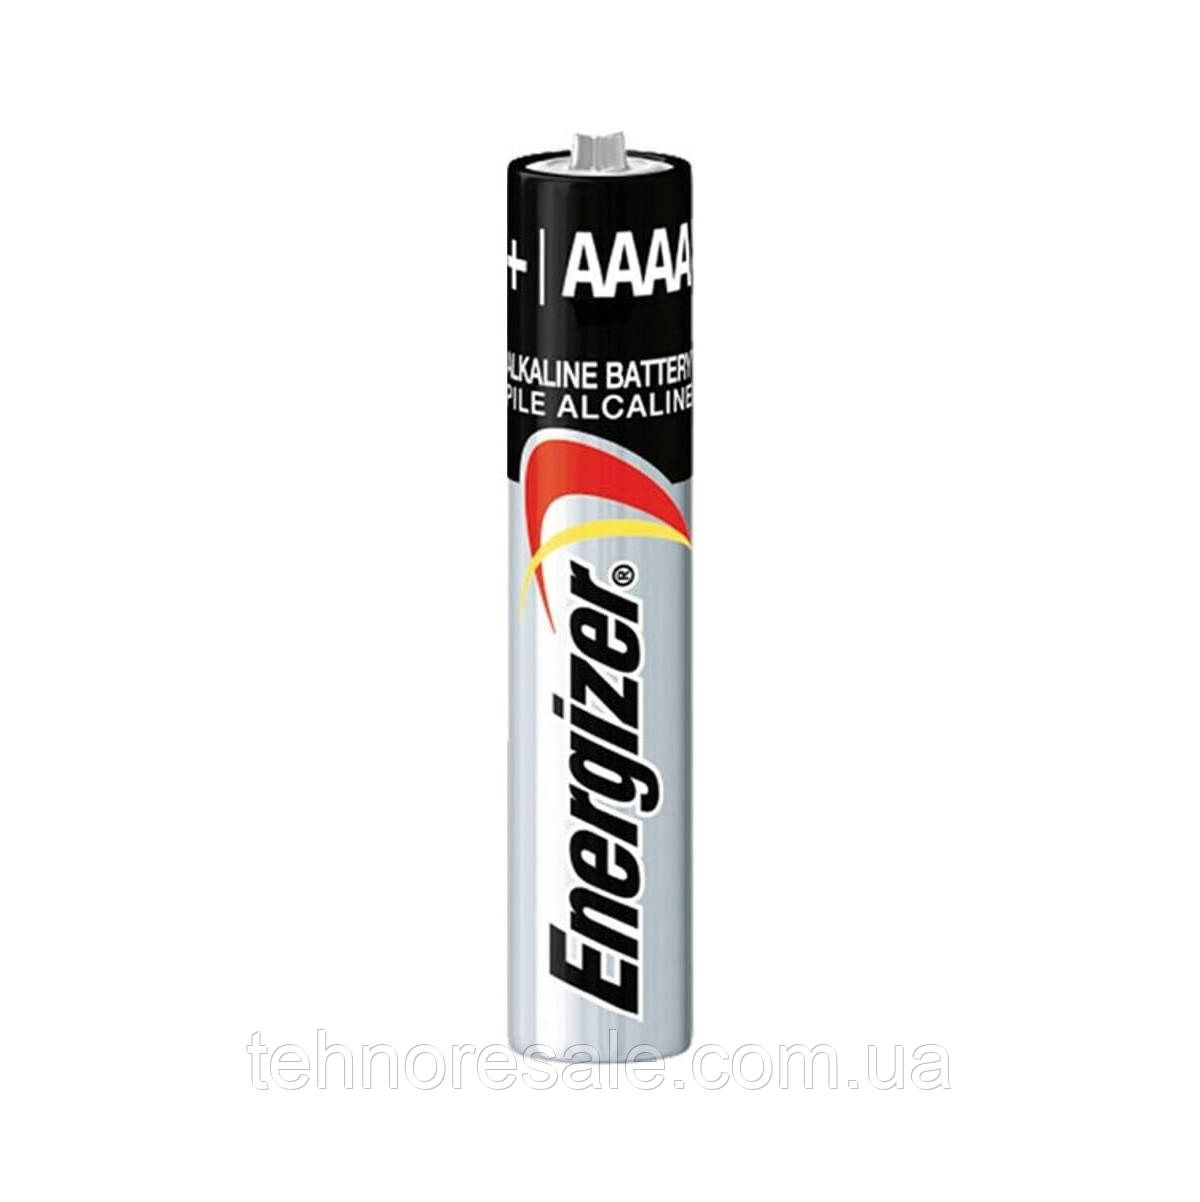 Батарейки Energizer AAAA LR61/E96/LR8D425 /1.5V АААА 500ма